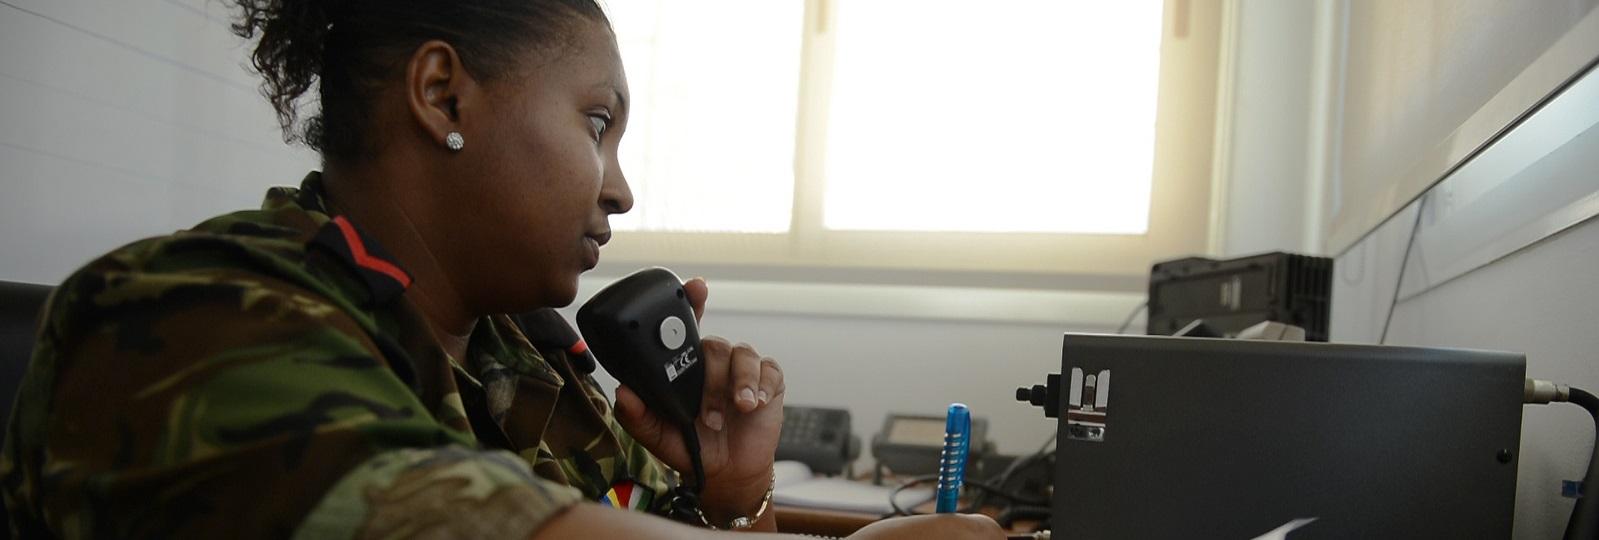 Lance Cpl. Hilary M. Leon, Seychelles Coast Guard radio operator